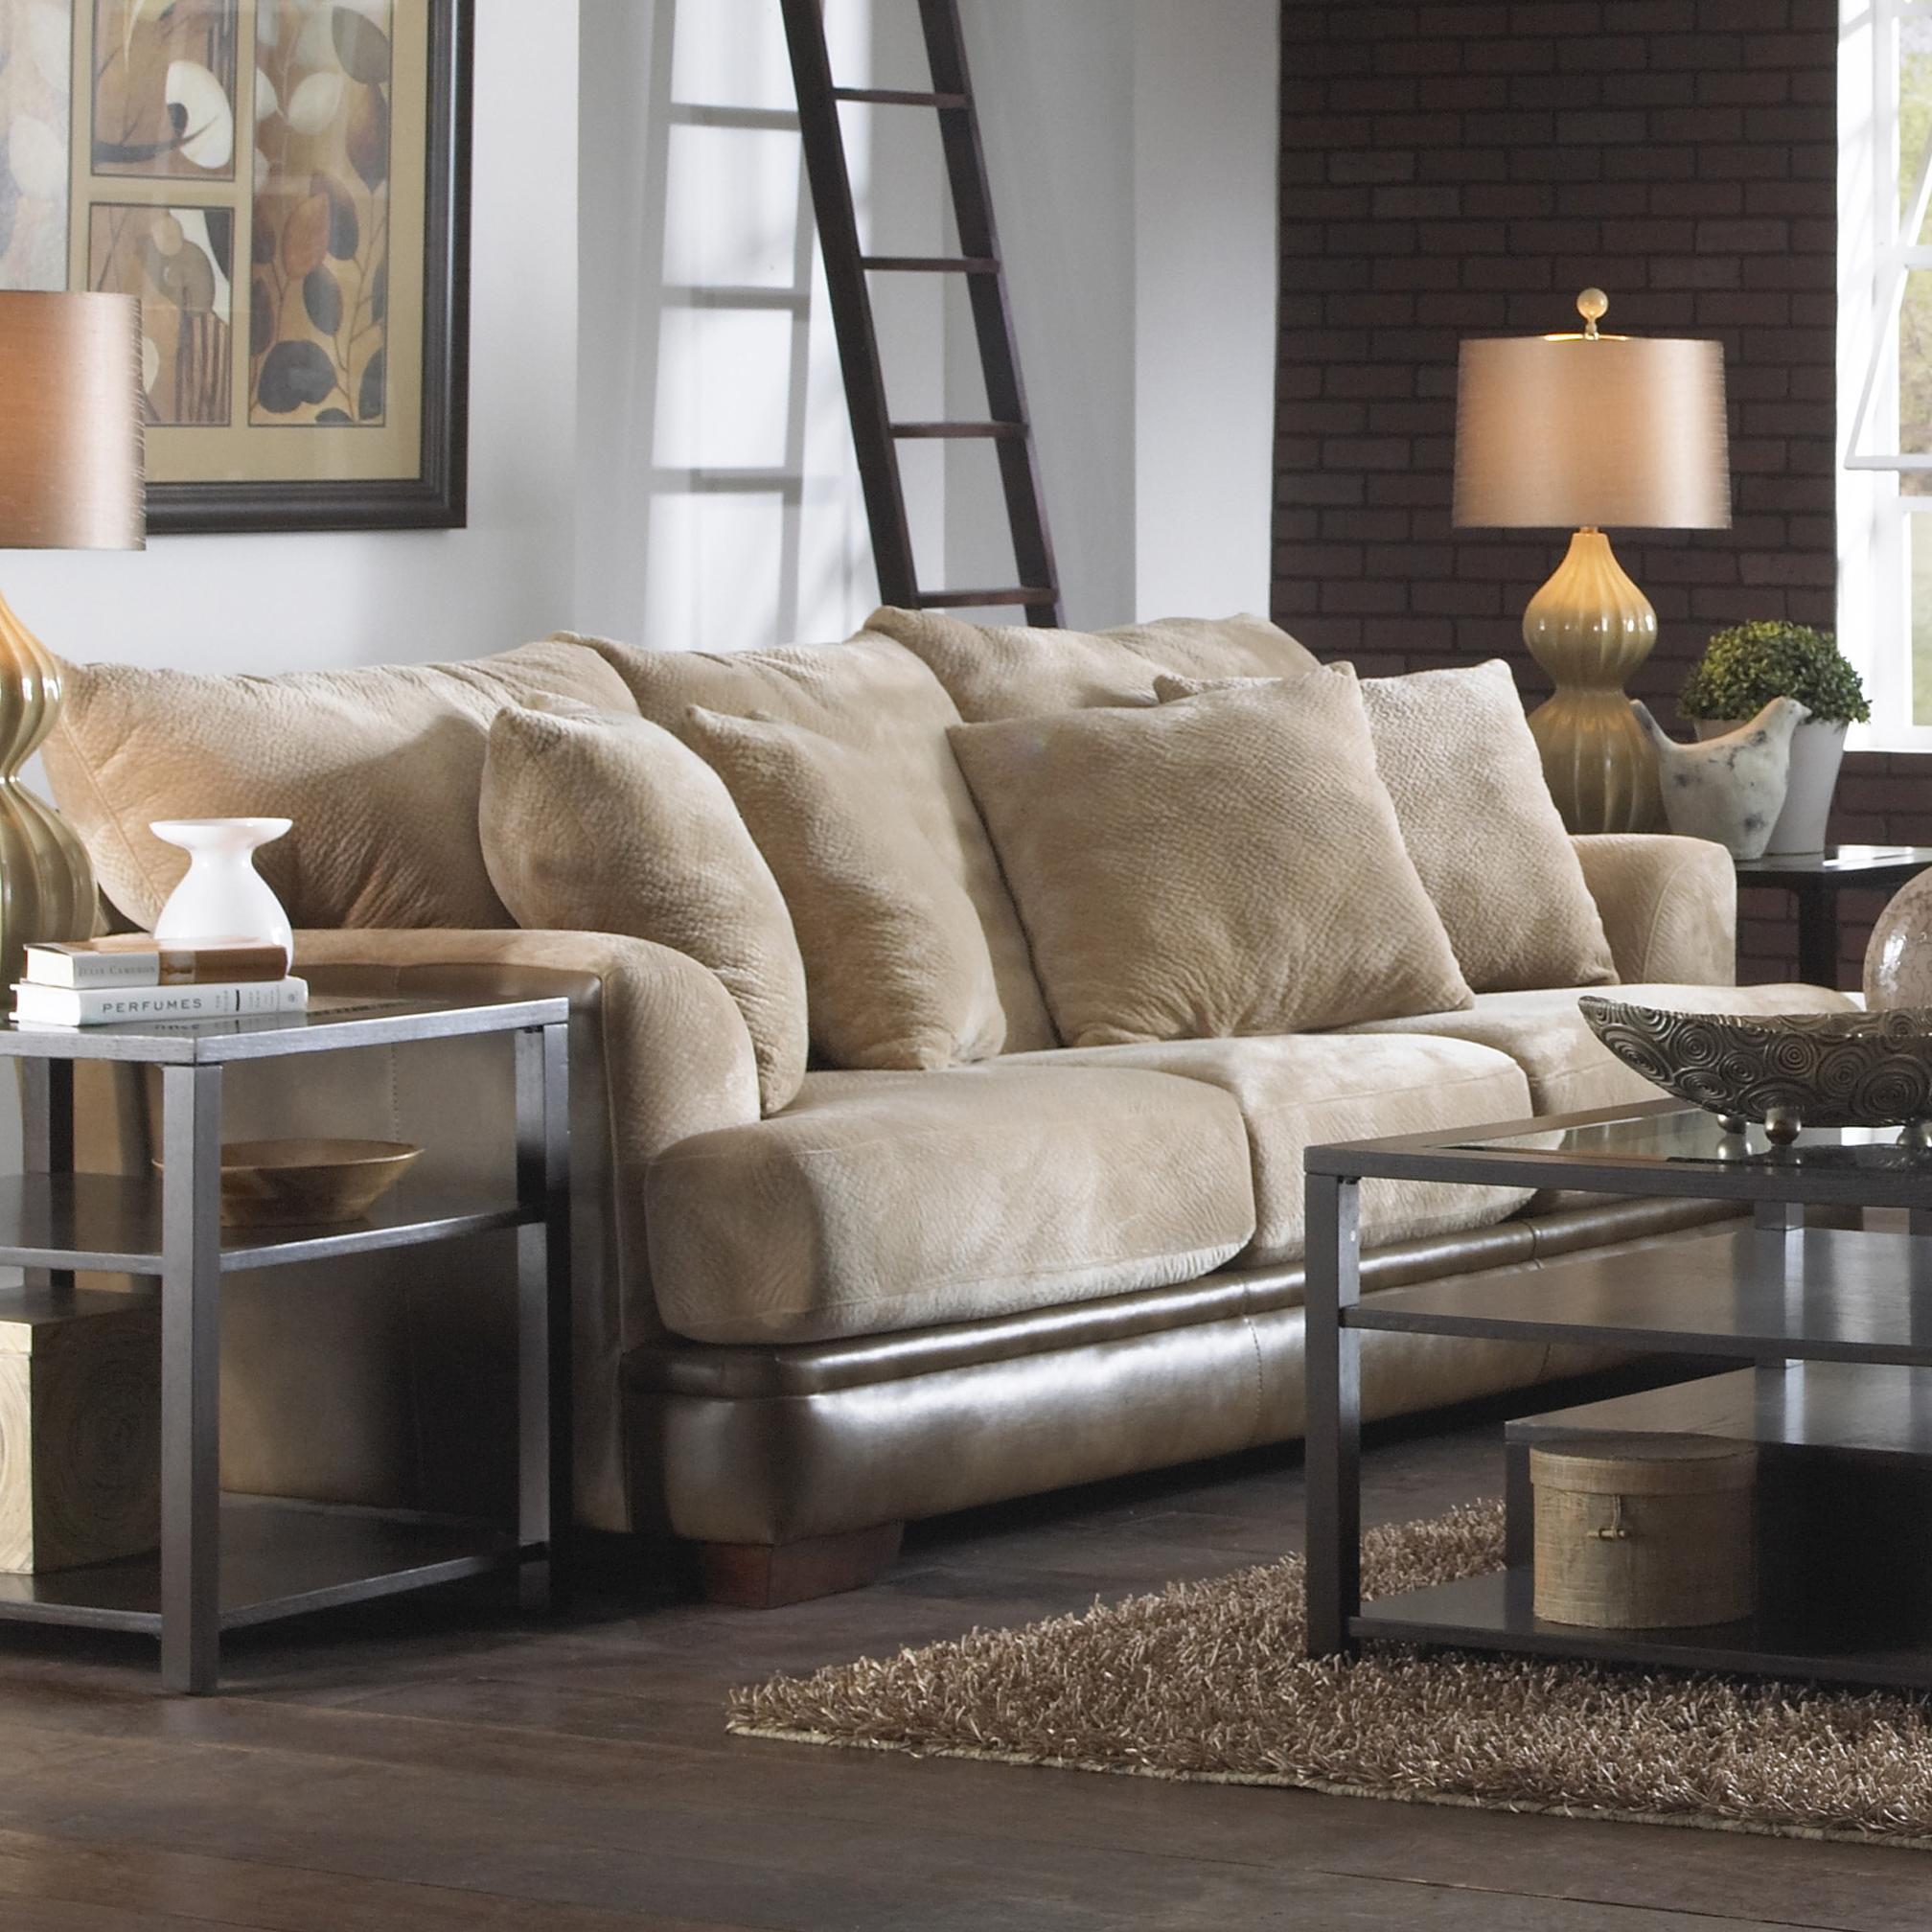 Jackson Furniture PIERCE Contemporary Sofa with Unique